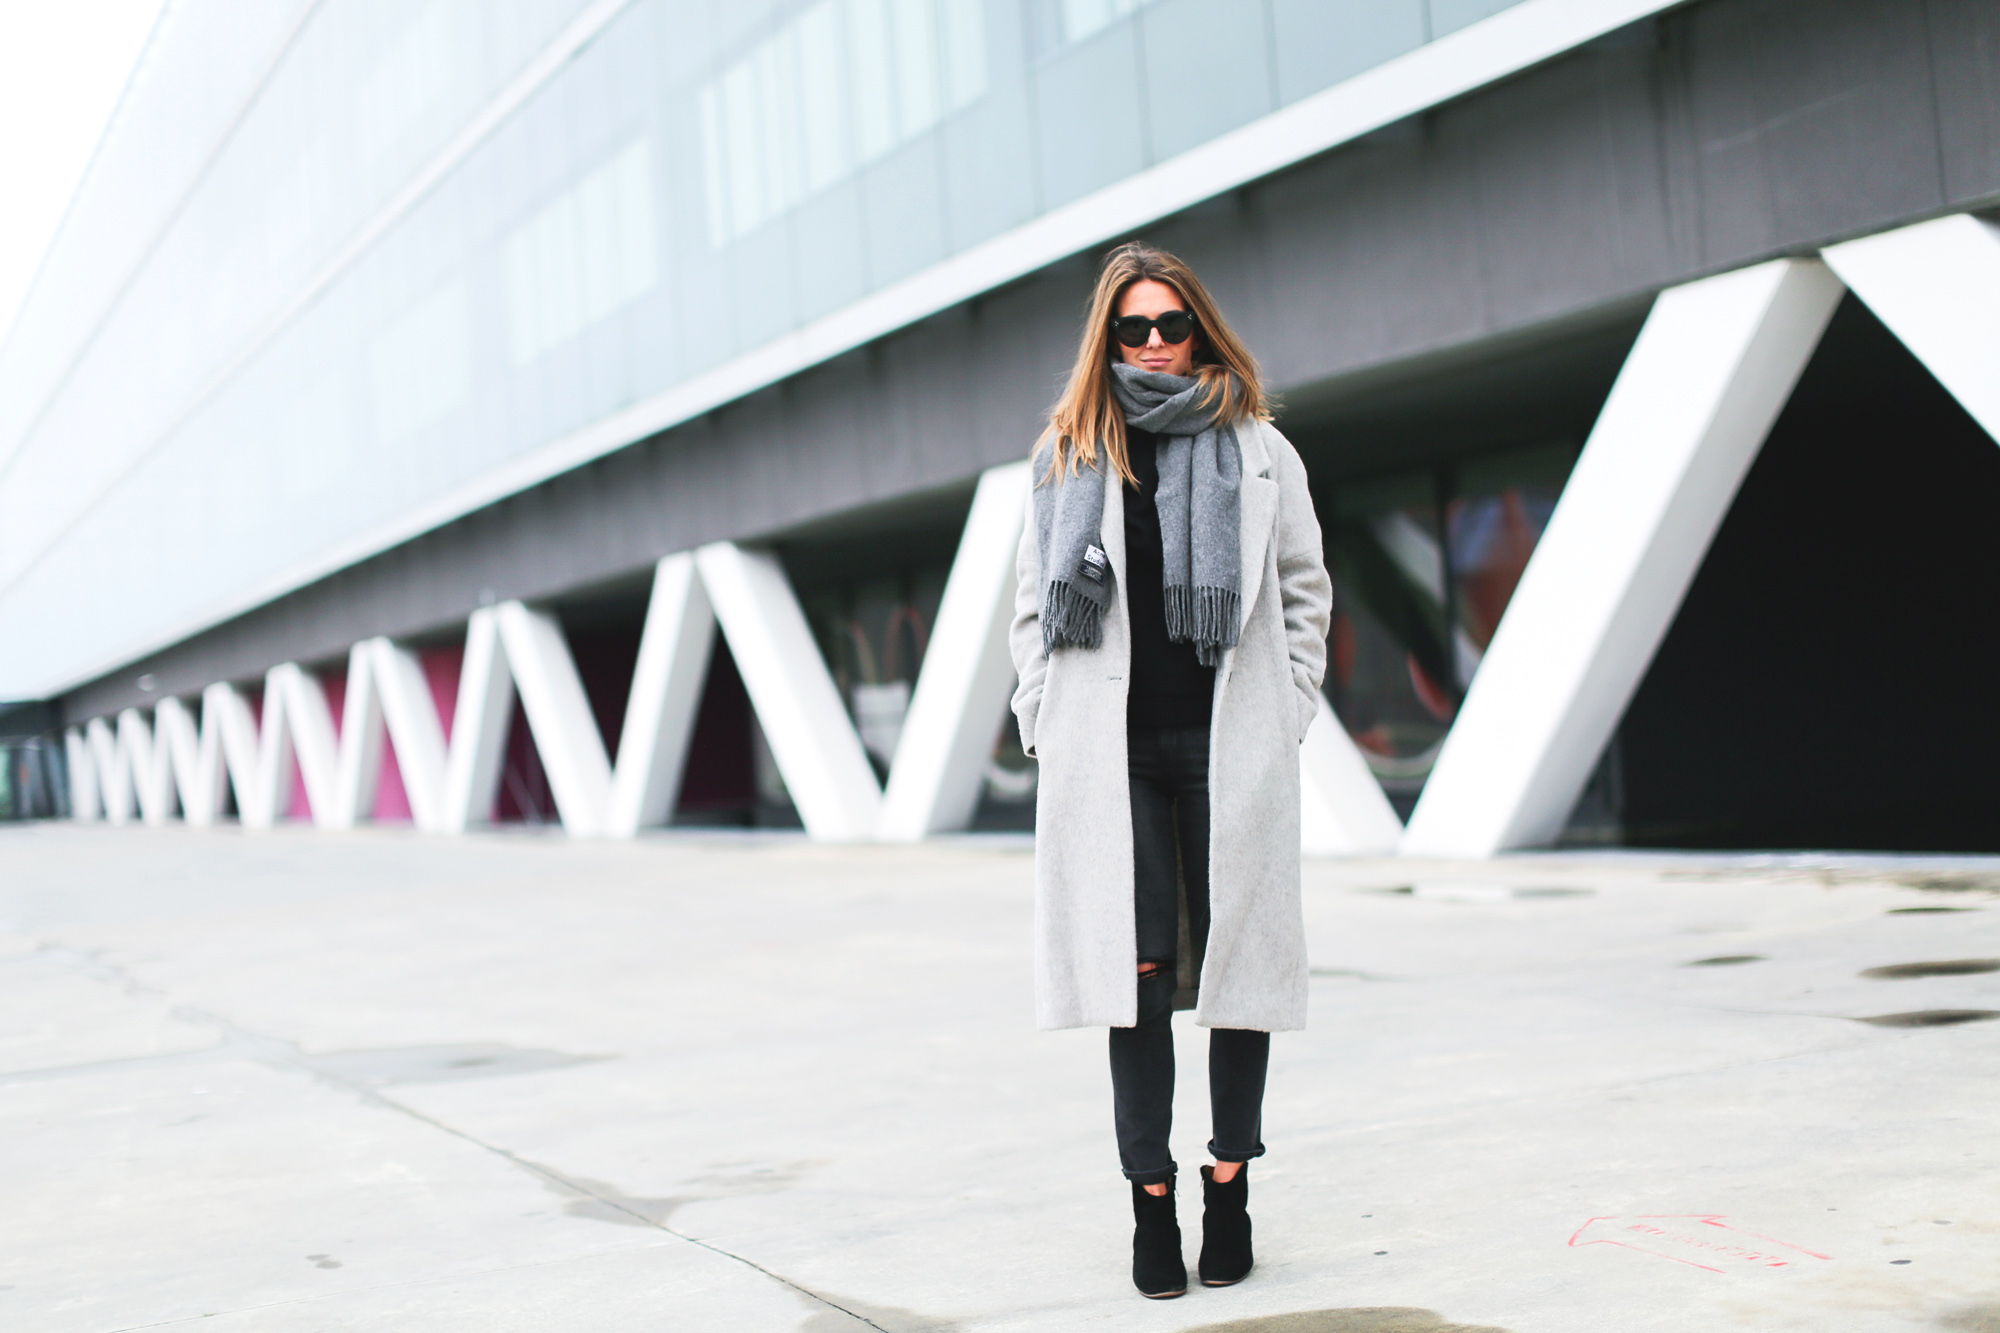 Clochet_streetstyle_fashionblogger_abrigolargogrislanamango_isabelmarantdicker_sudaderalazoclaudiepierlot-3